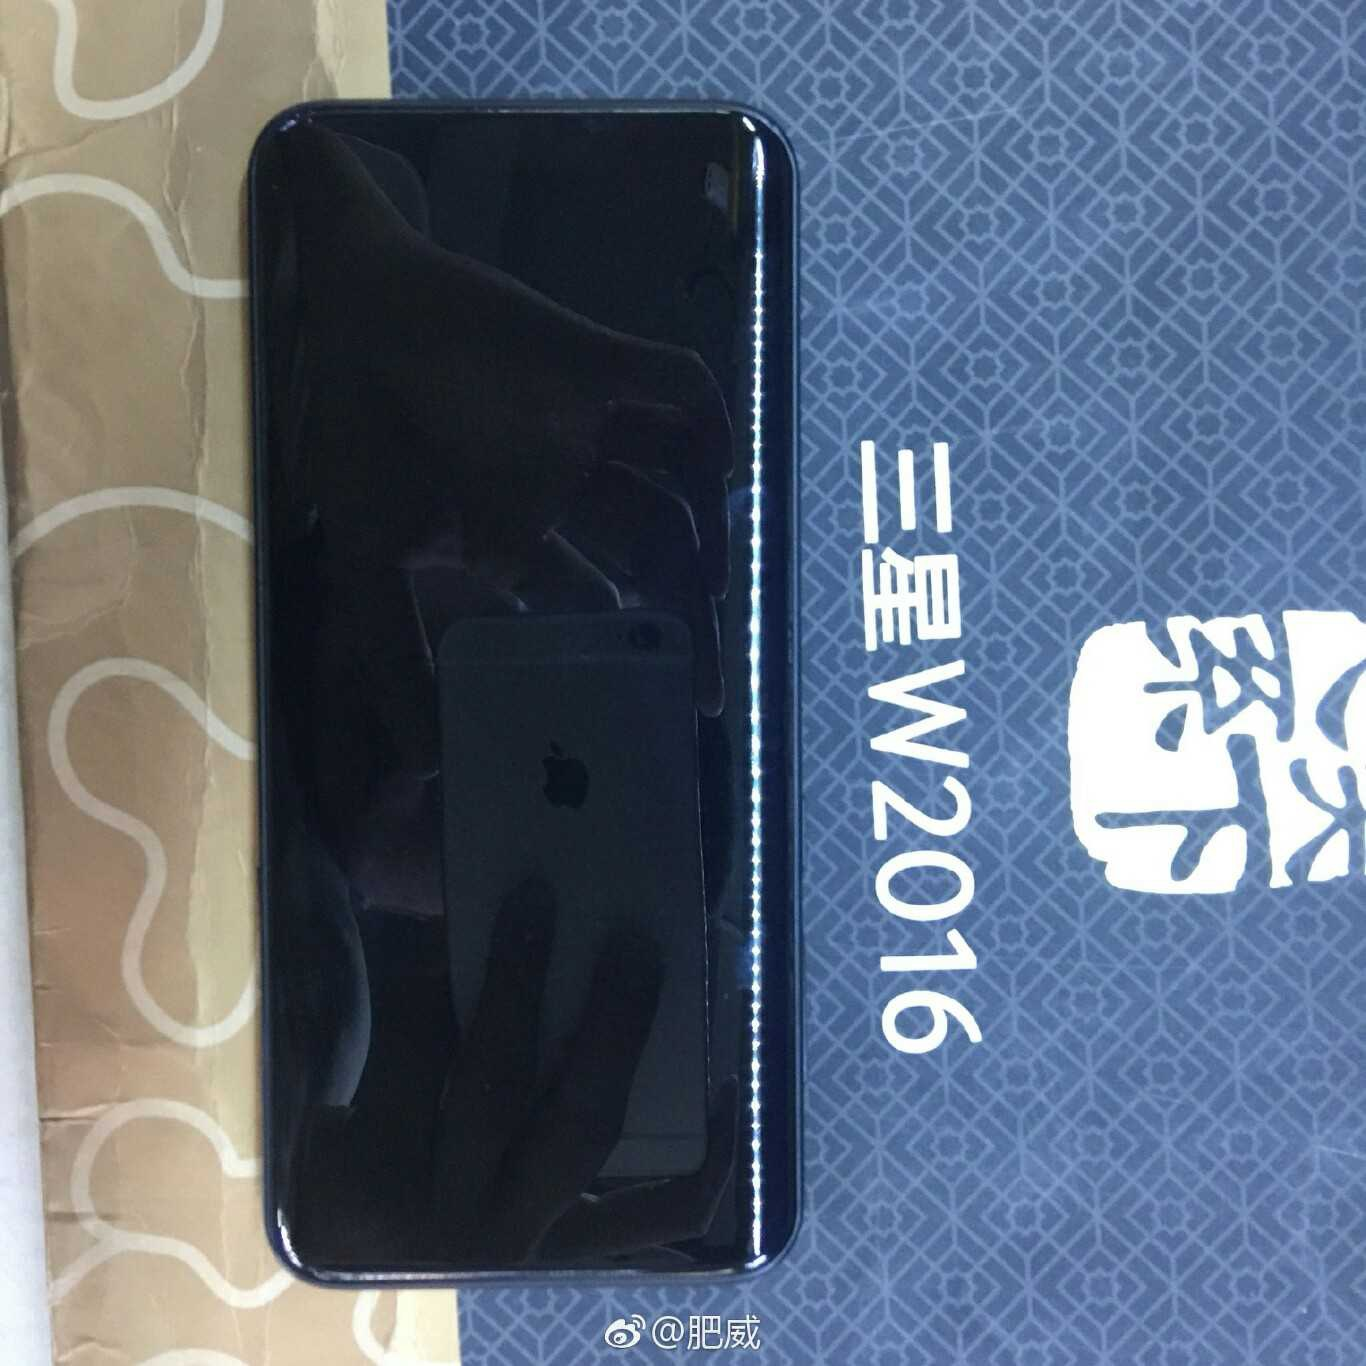 Новые фотографии Самсунг  Galaxy S8— Утечка